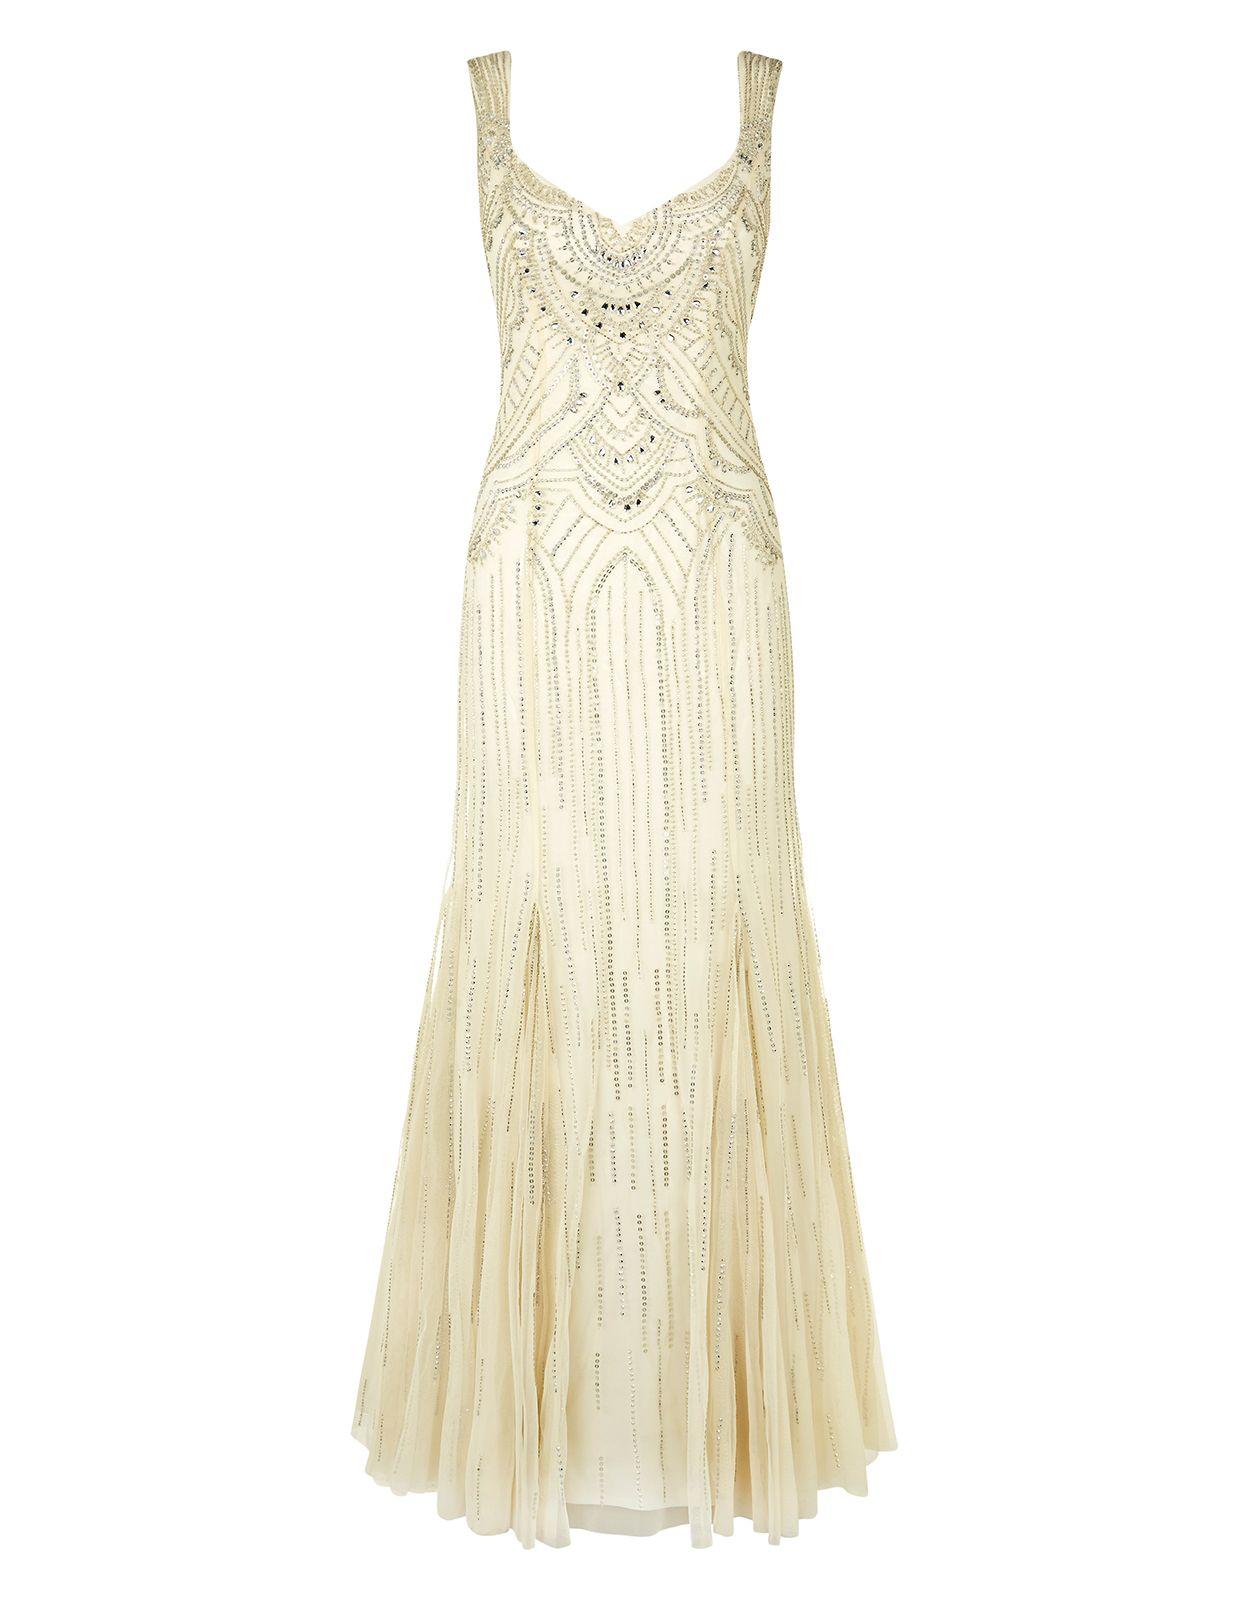 Sophia Bridal Dress Ivory Monsoon